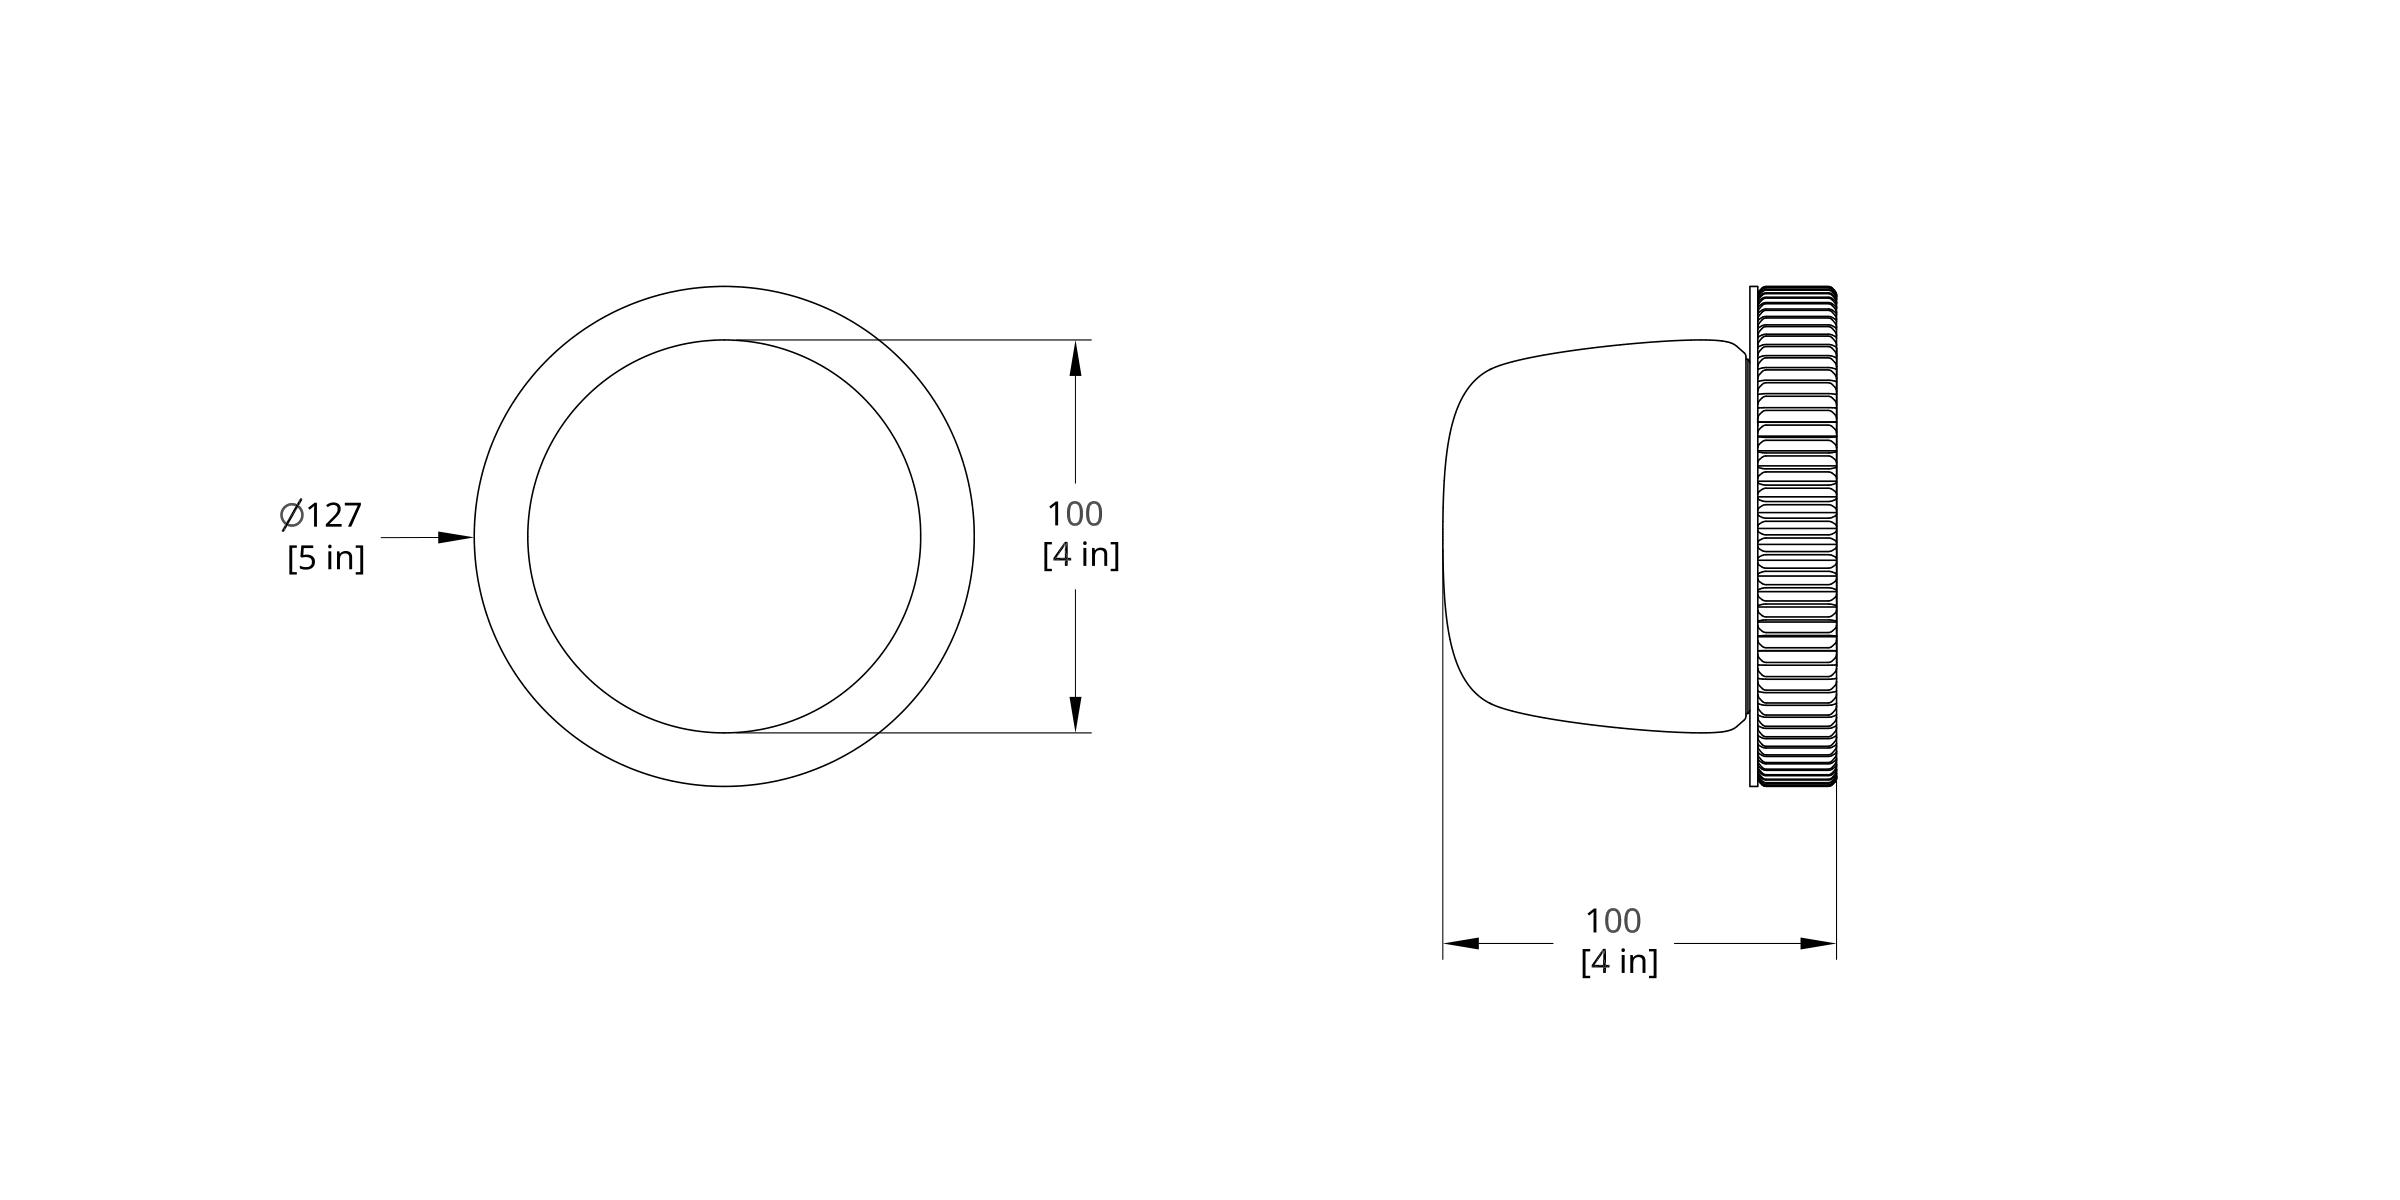 HS-0-A Hoist Sconce Bare Small Diffuser Dimension